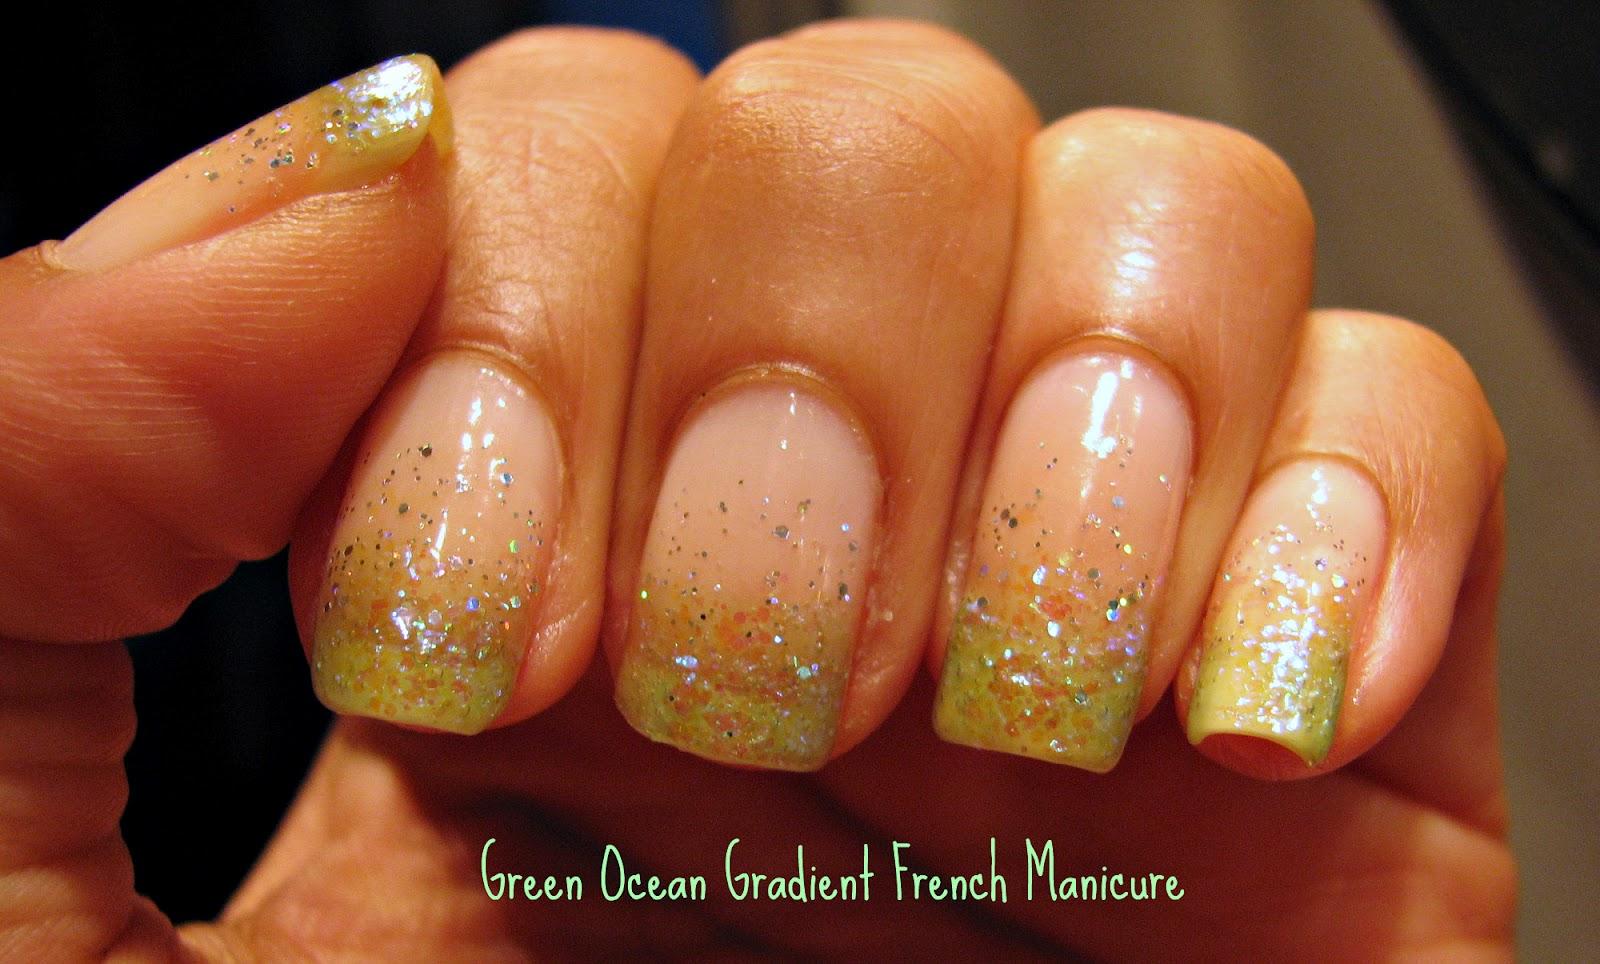 Mangling my Manicure: Green Ocean glitter gradient manicure